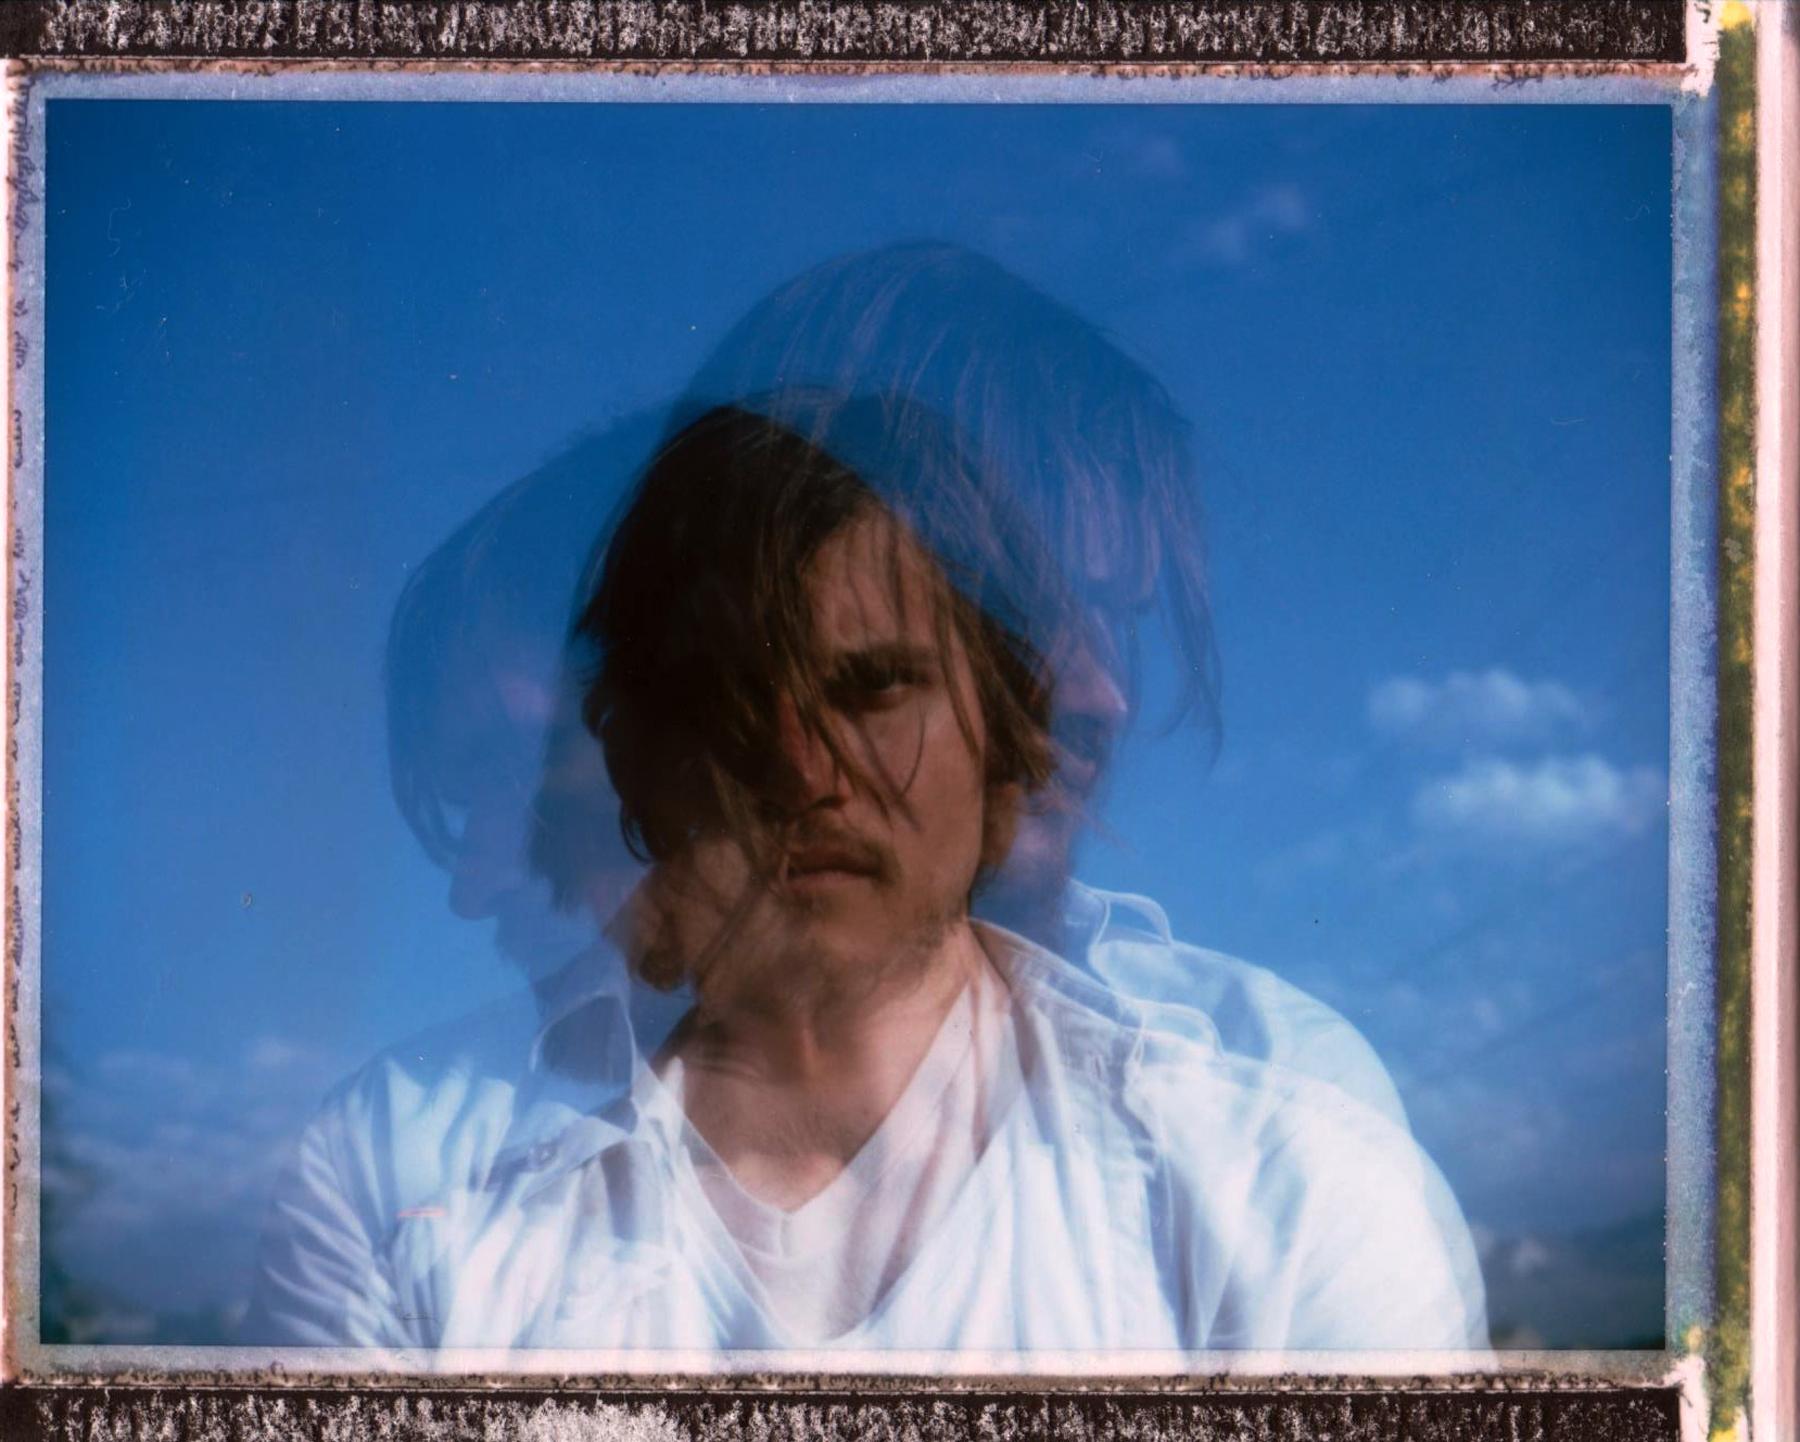 I Have Known Every Incarnation   Polaroid 230 Land Camera   FP100C   Abigail Crone